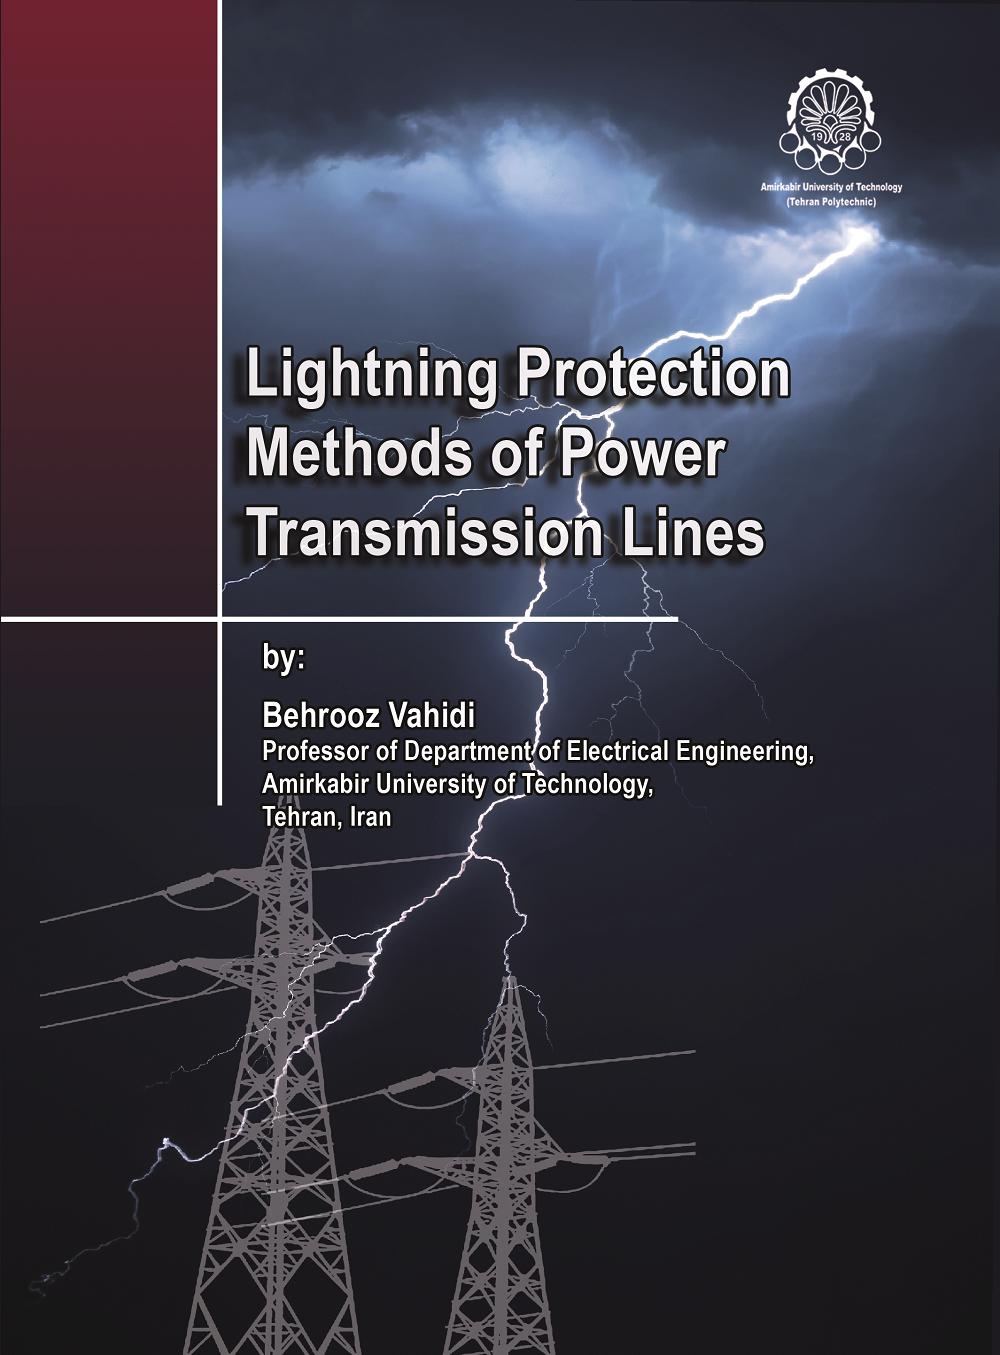 Lightning Protection Methods of Power Transmission Lines